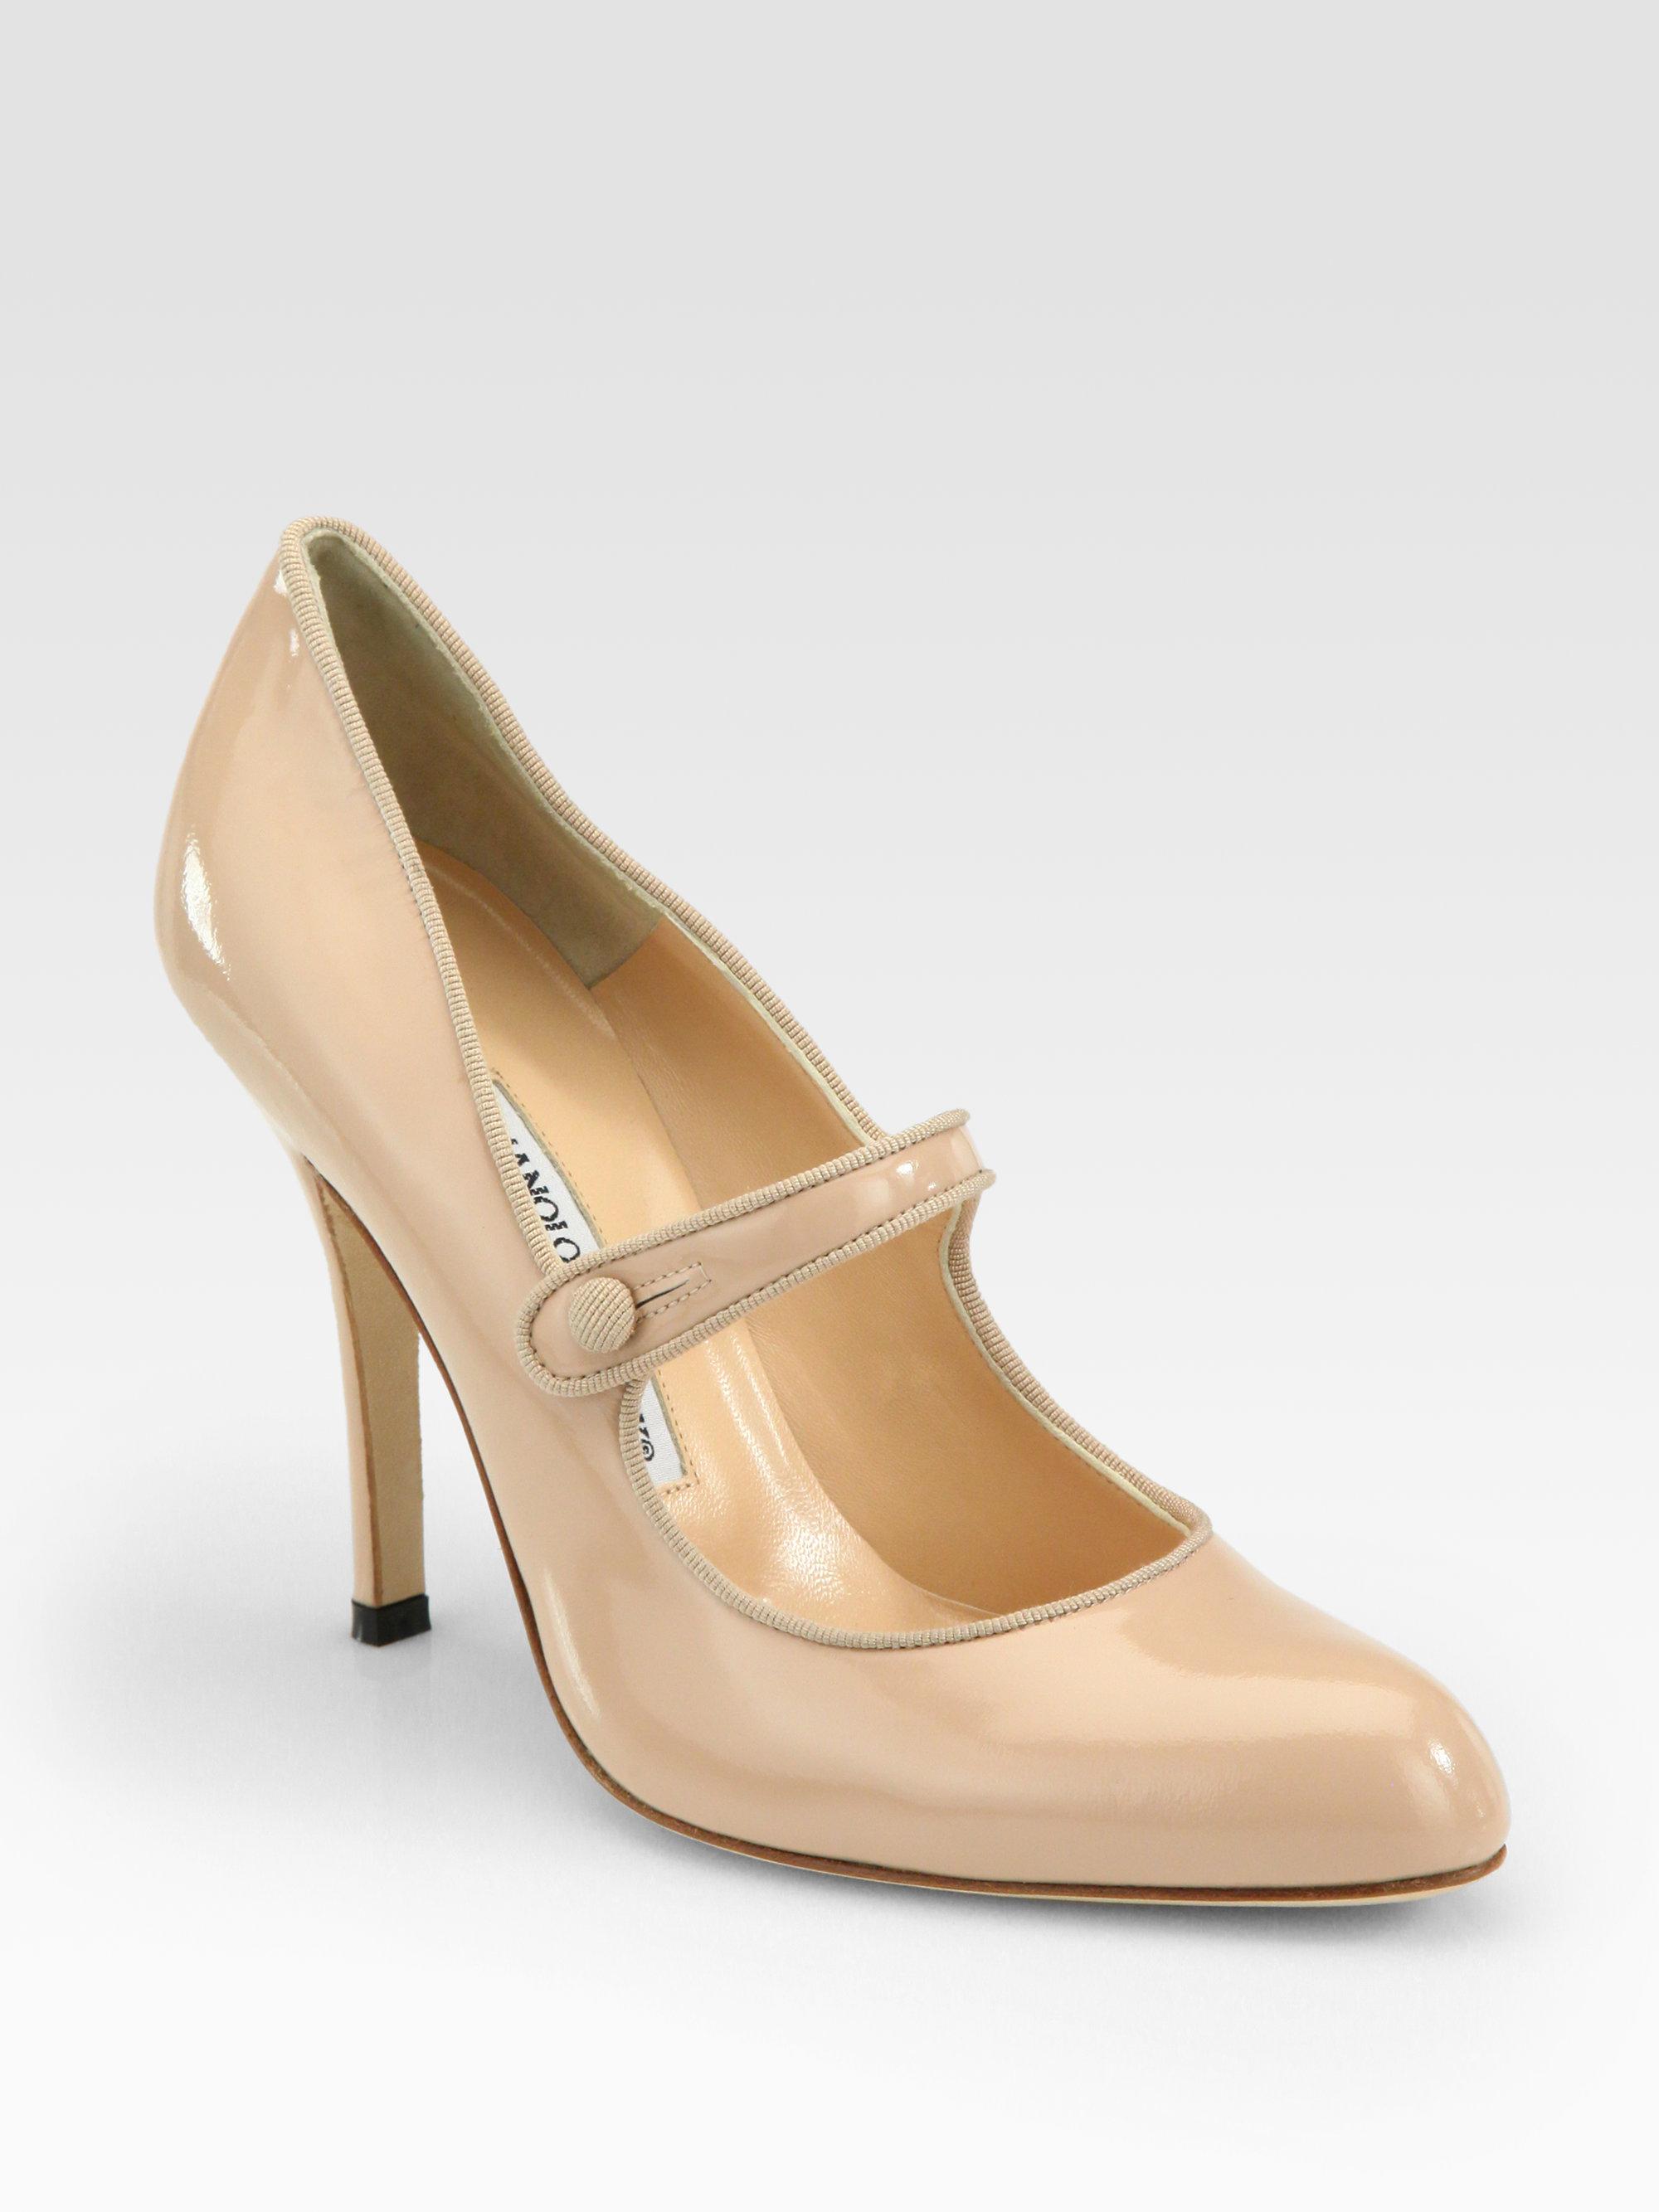 Rimocy Chunky Heel Platform Mary Janes Women Patent